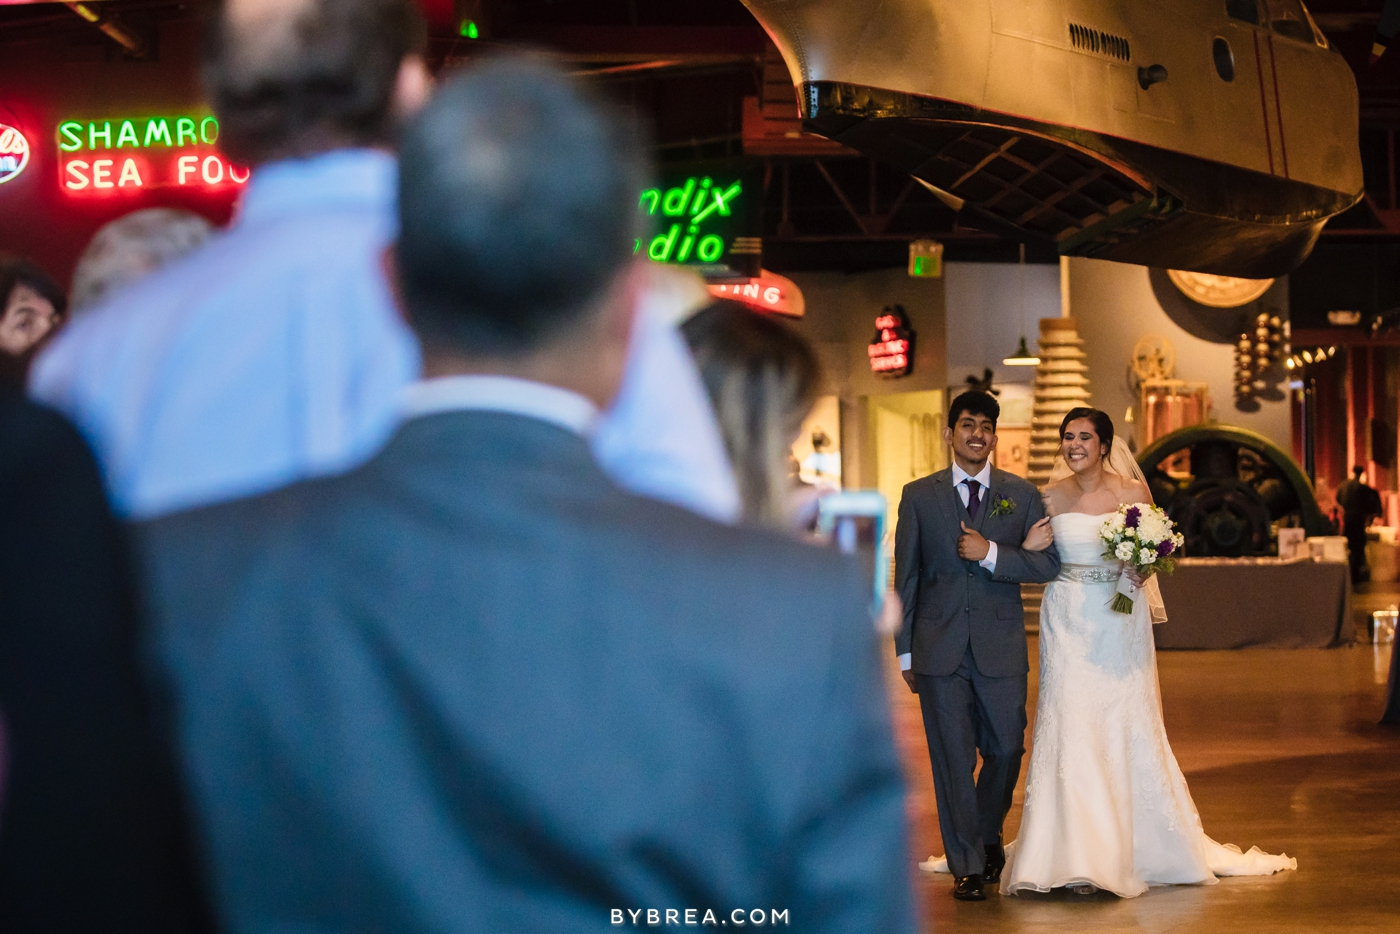 Baltimore Museum of Industry wedding bride walking down aisle